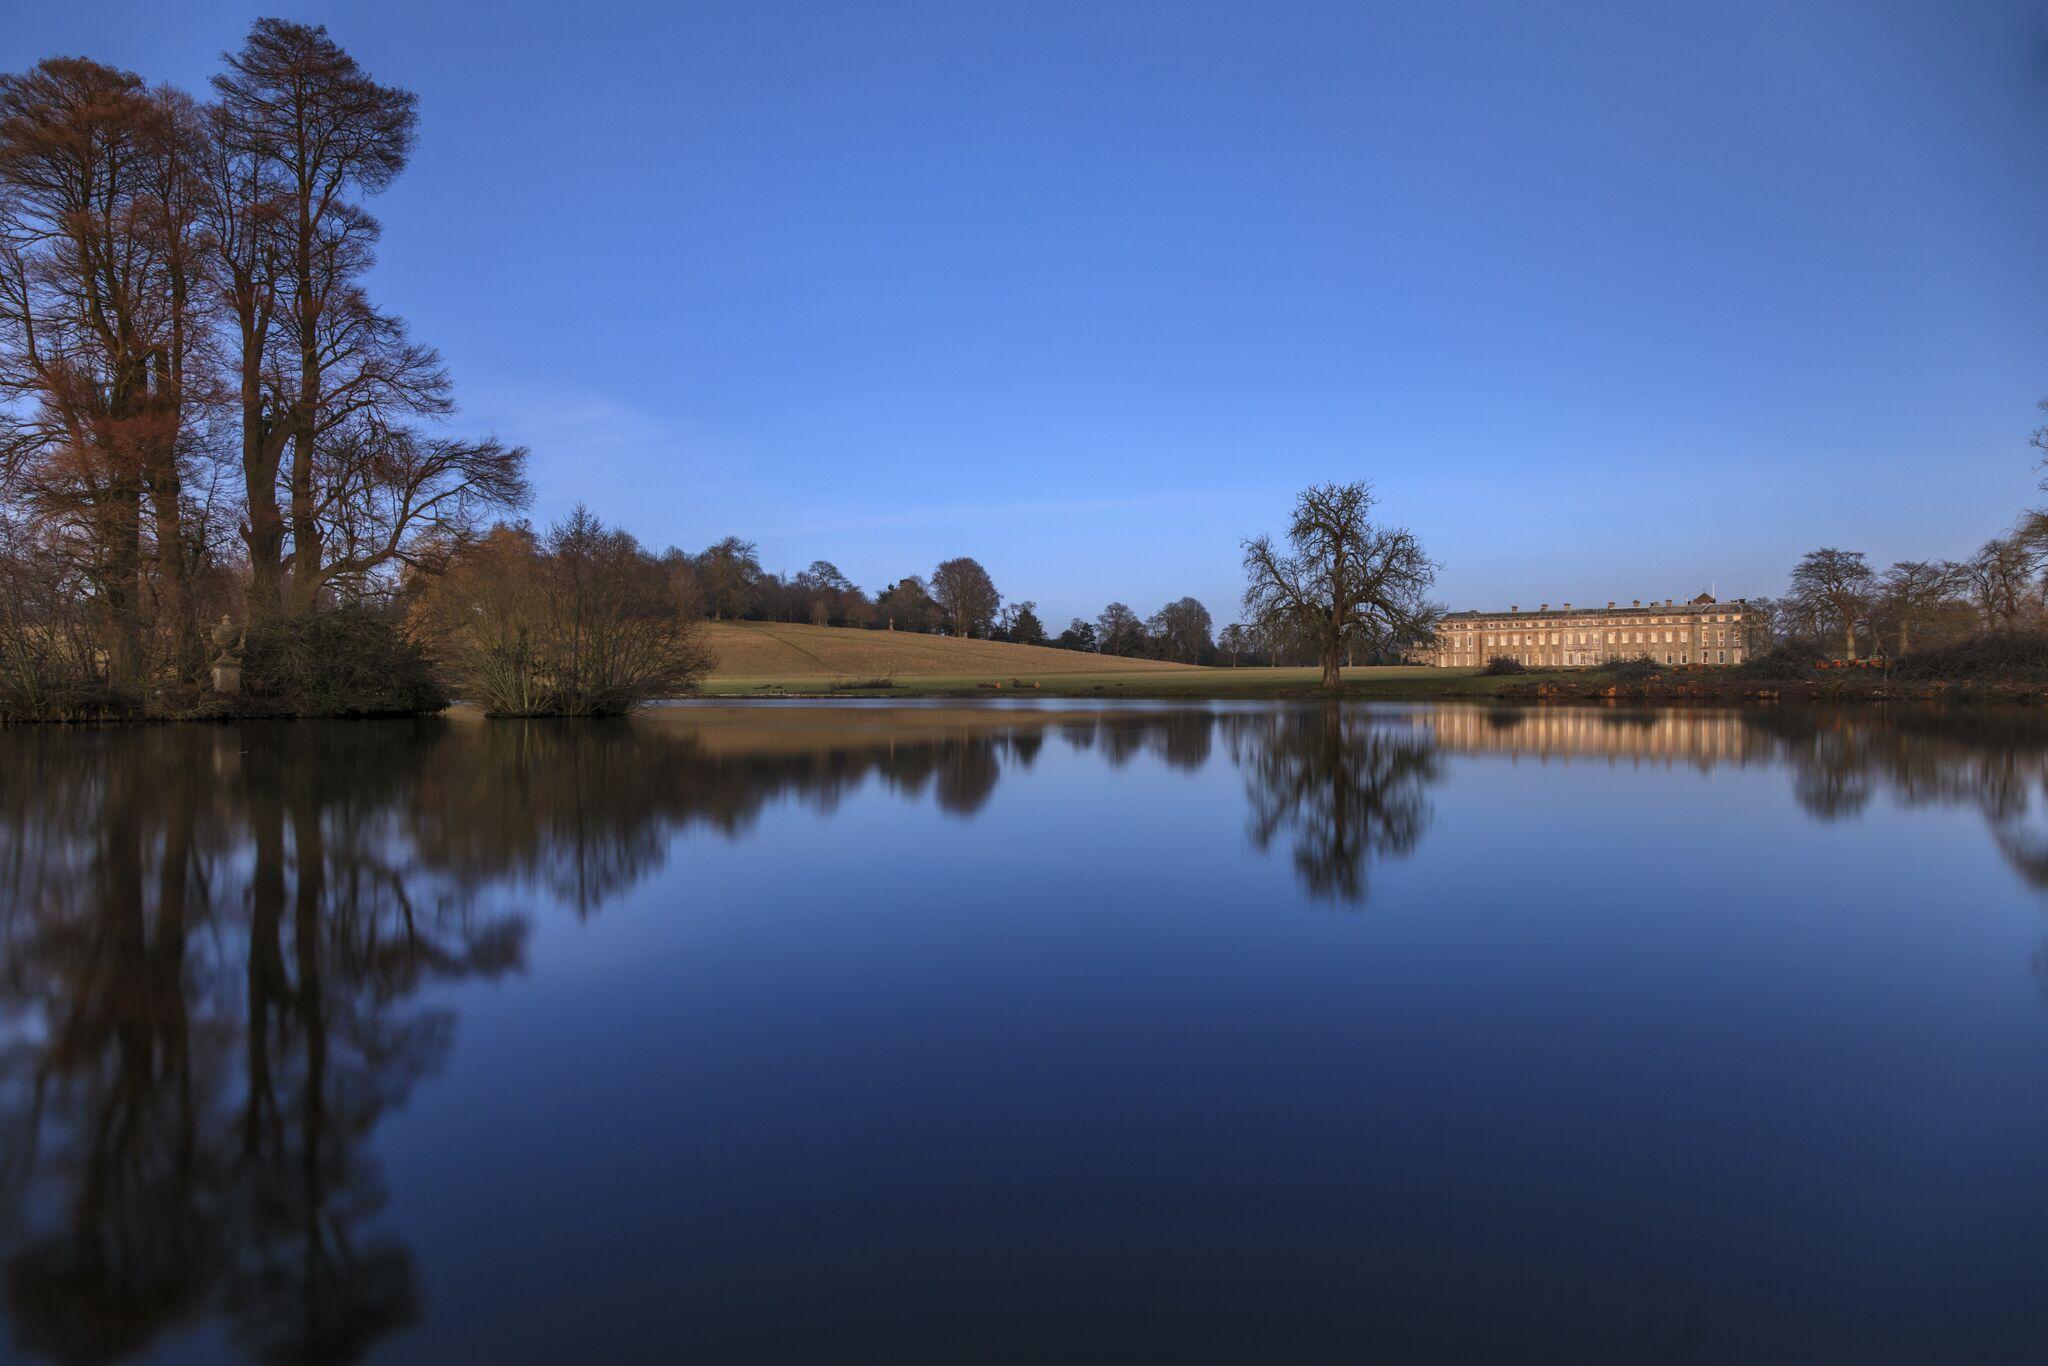 National Trust Images_John Miller 3_preview.jpeg